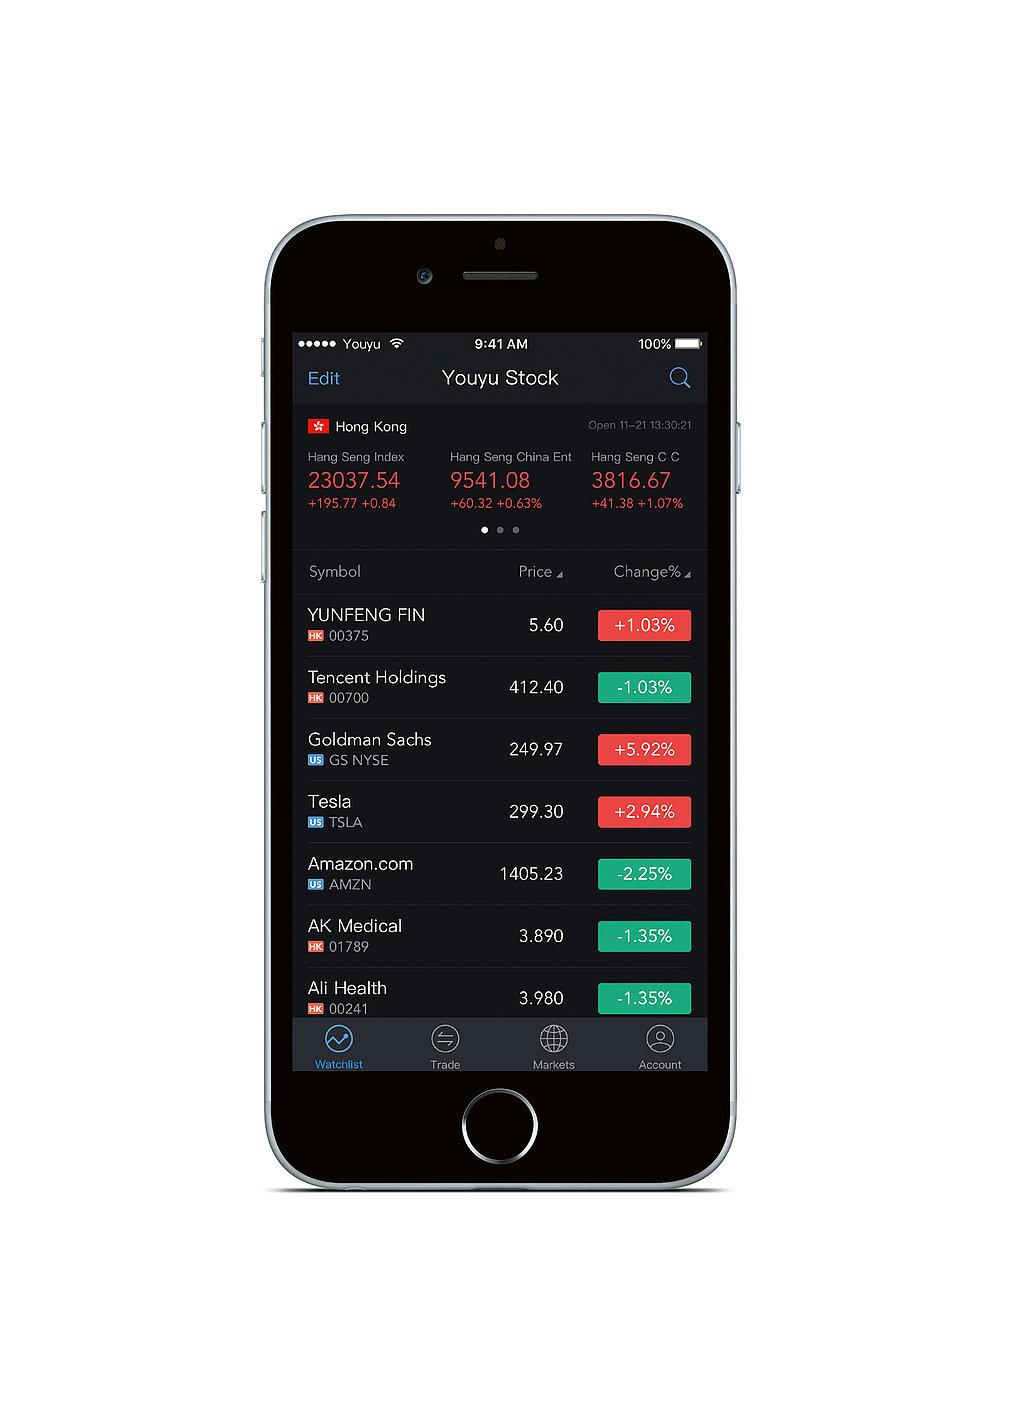 Youyu Stock | Red Dot Design Award